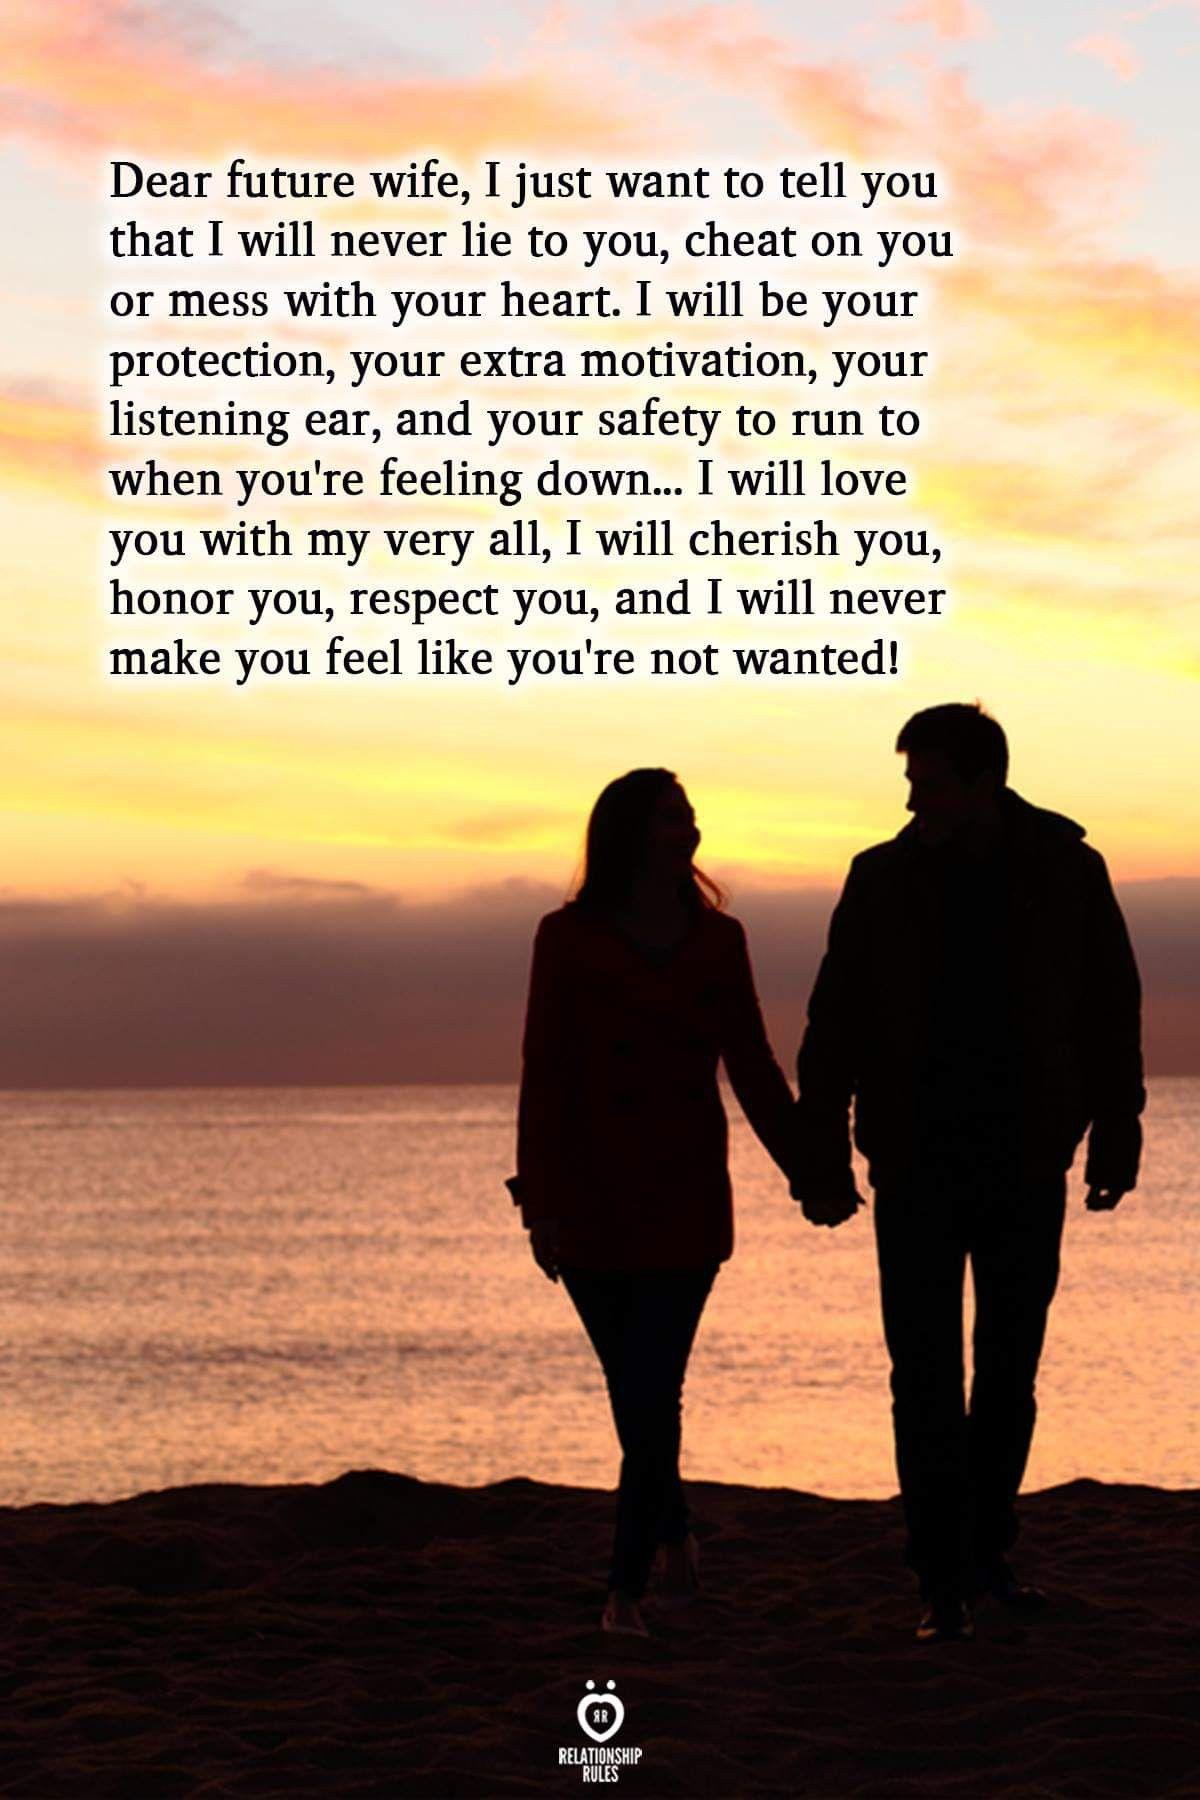 Pin By Trent Wilkins On Dear Future Wife When Youre Feeling Down Dear Future Feeling Down